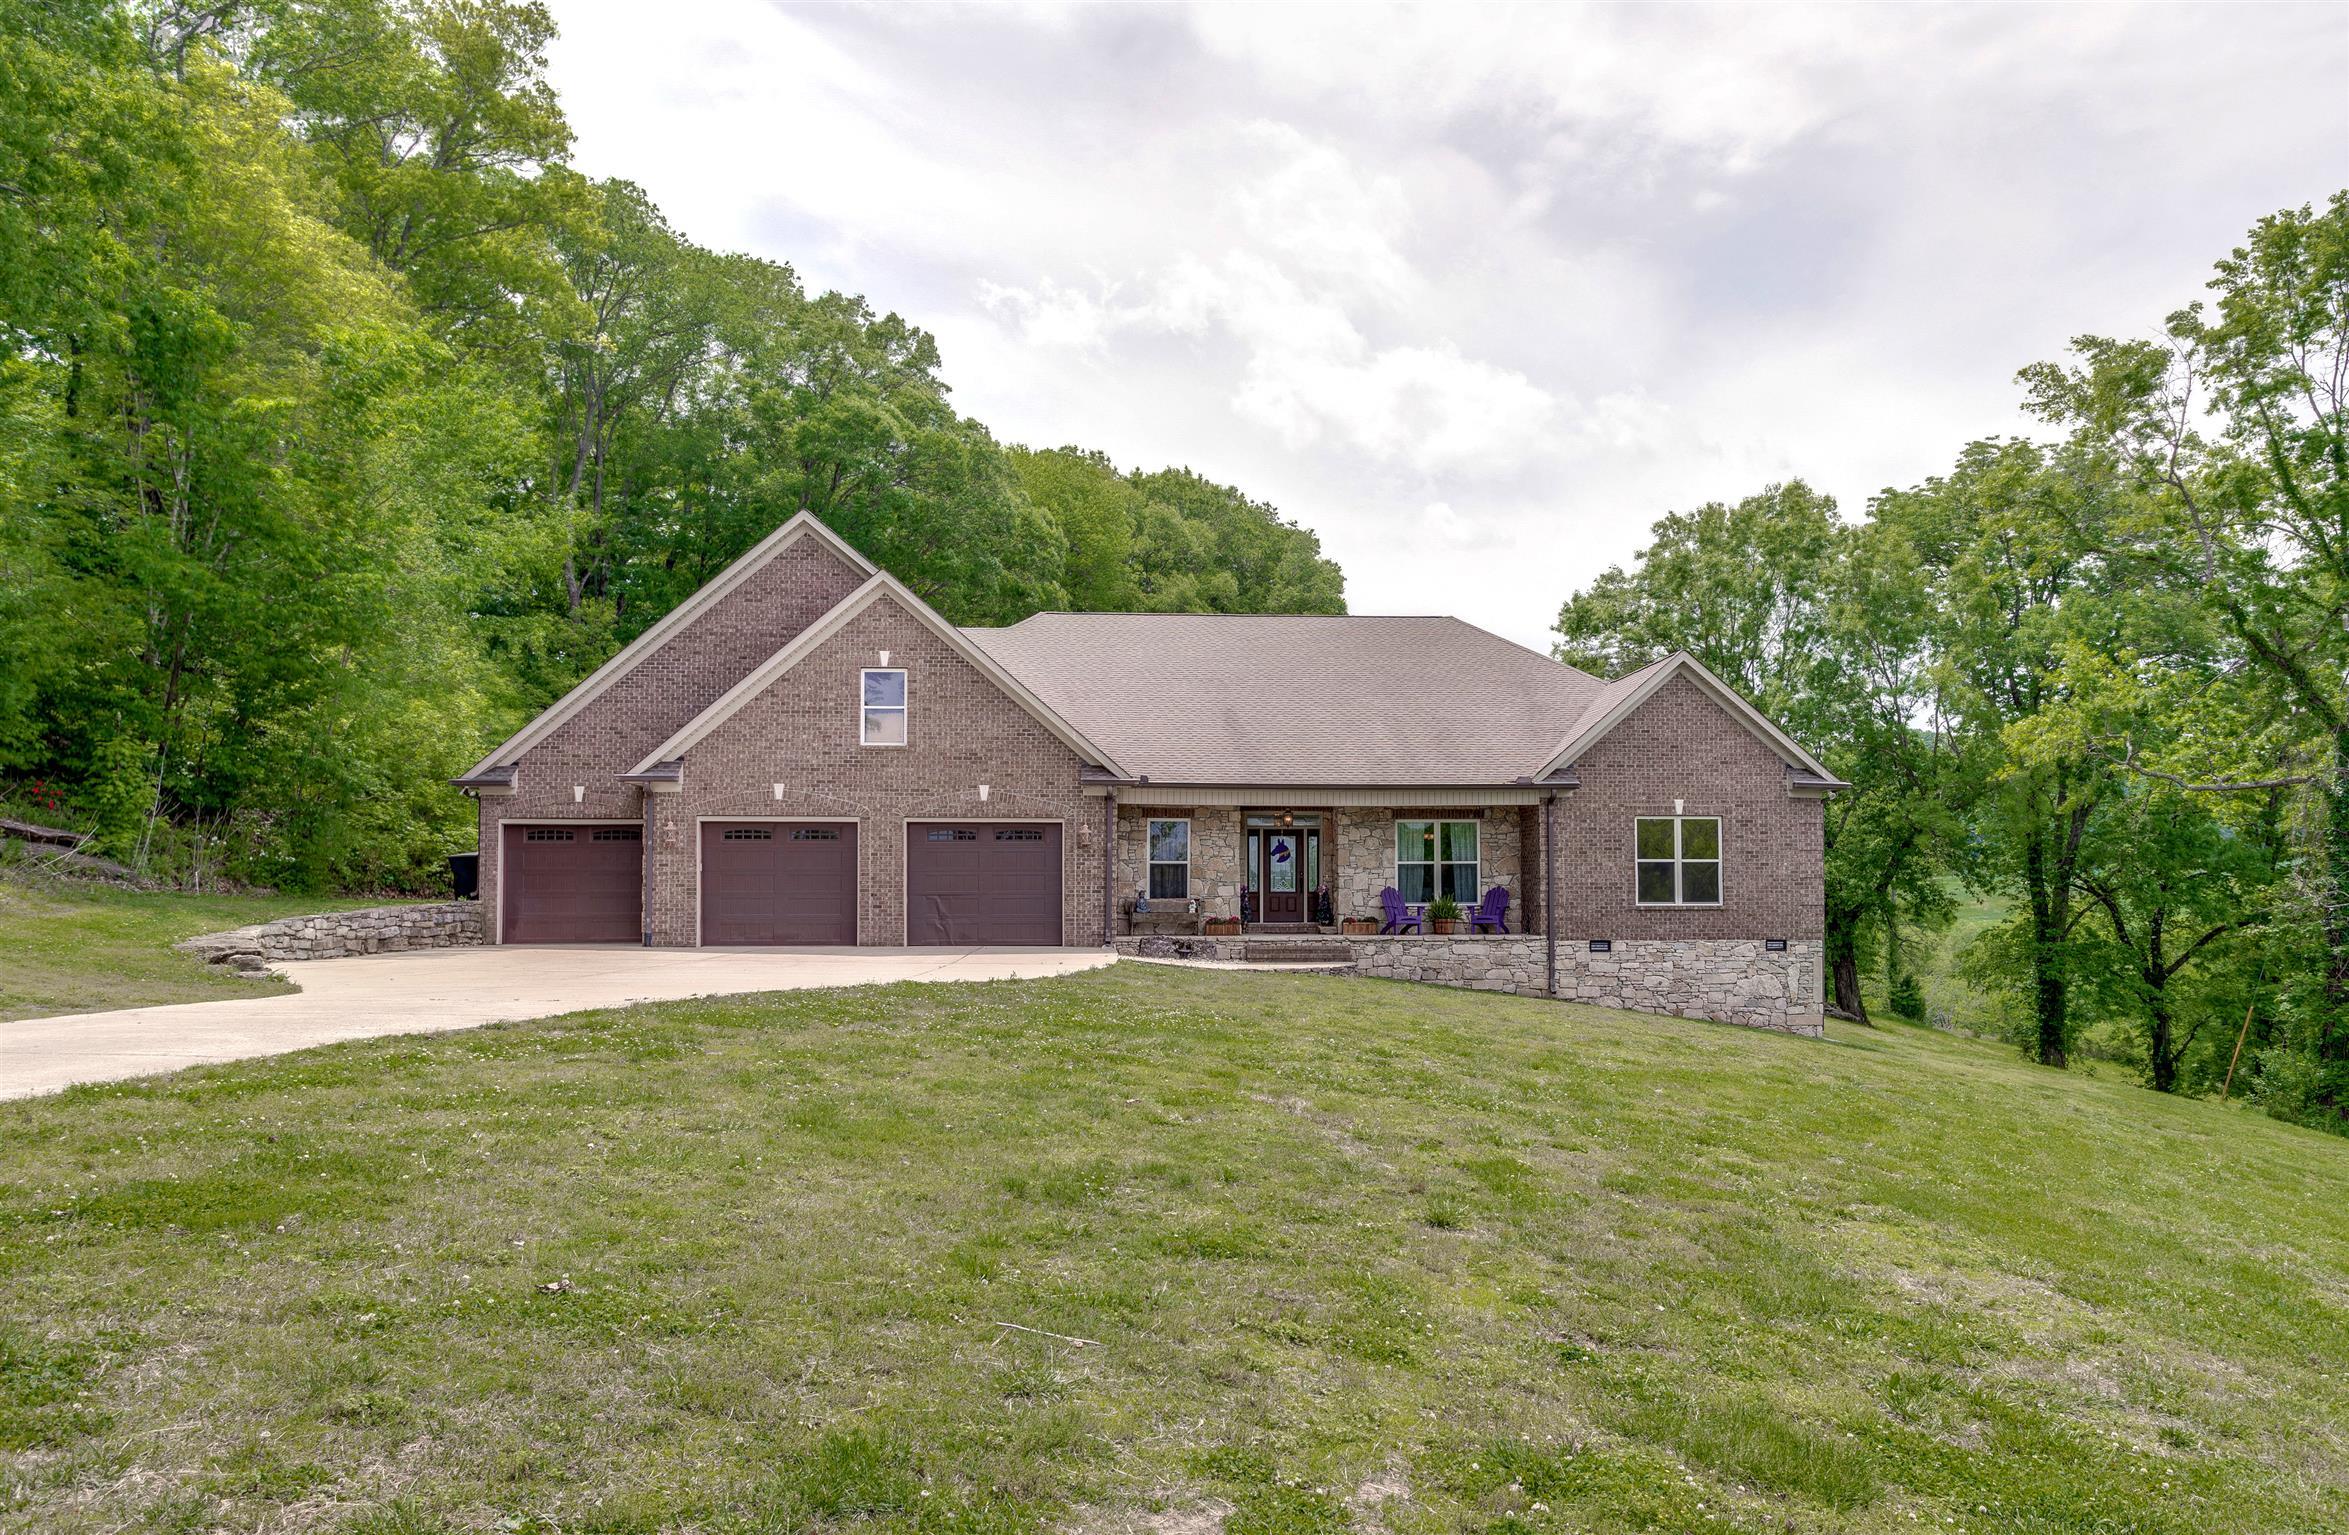 4003 Catheys Creek Rd, Hampshire, TN 38461 - Hampshire, TN real estate listing